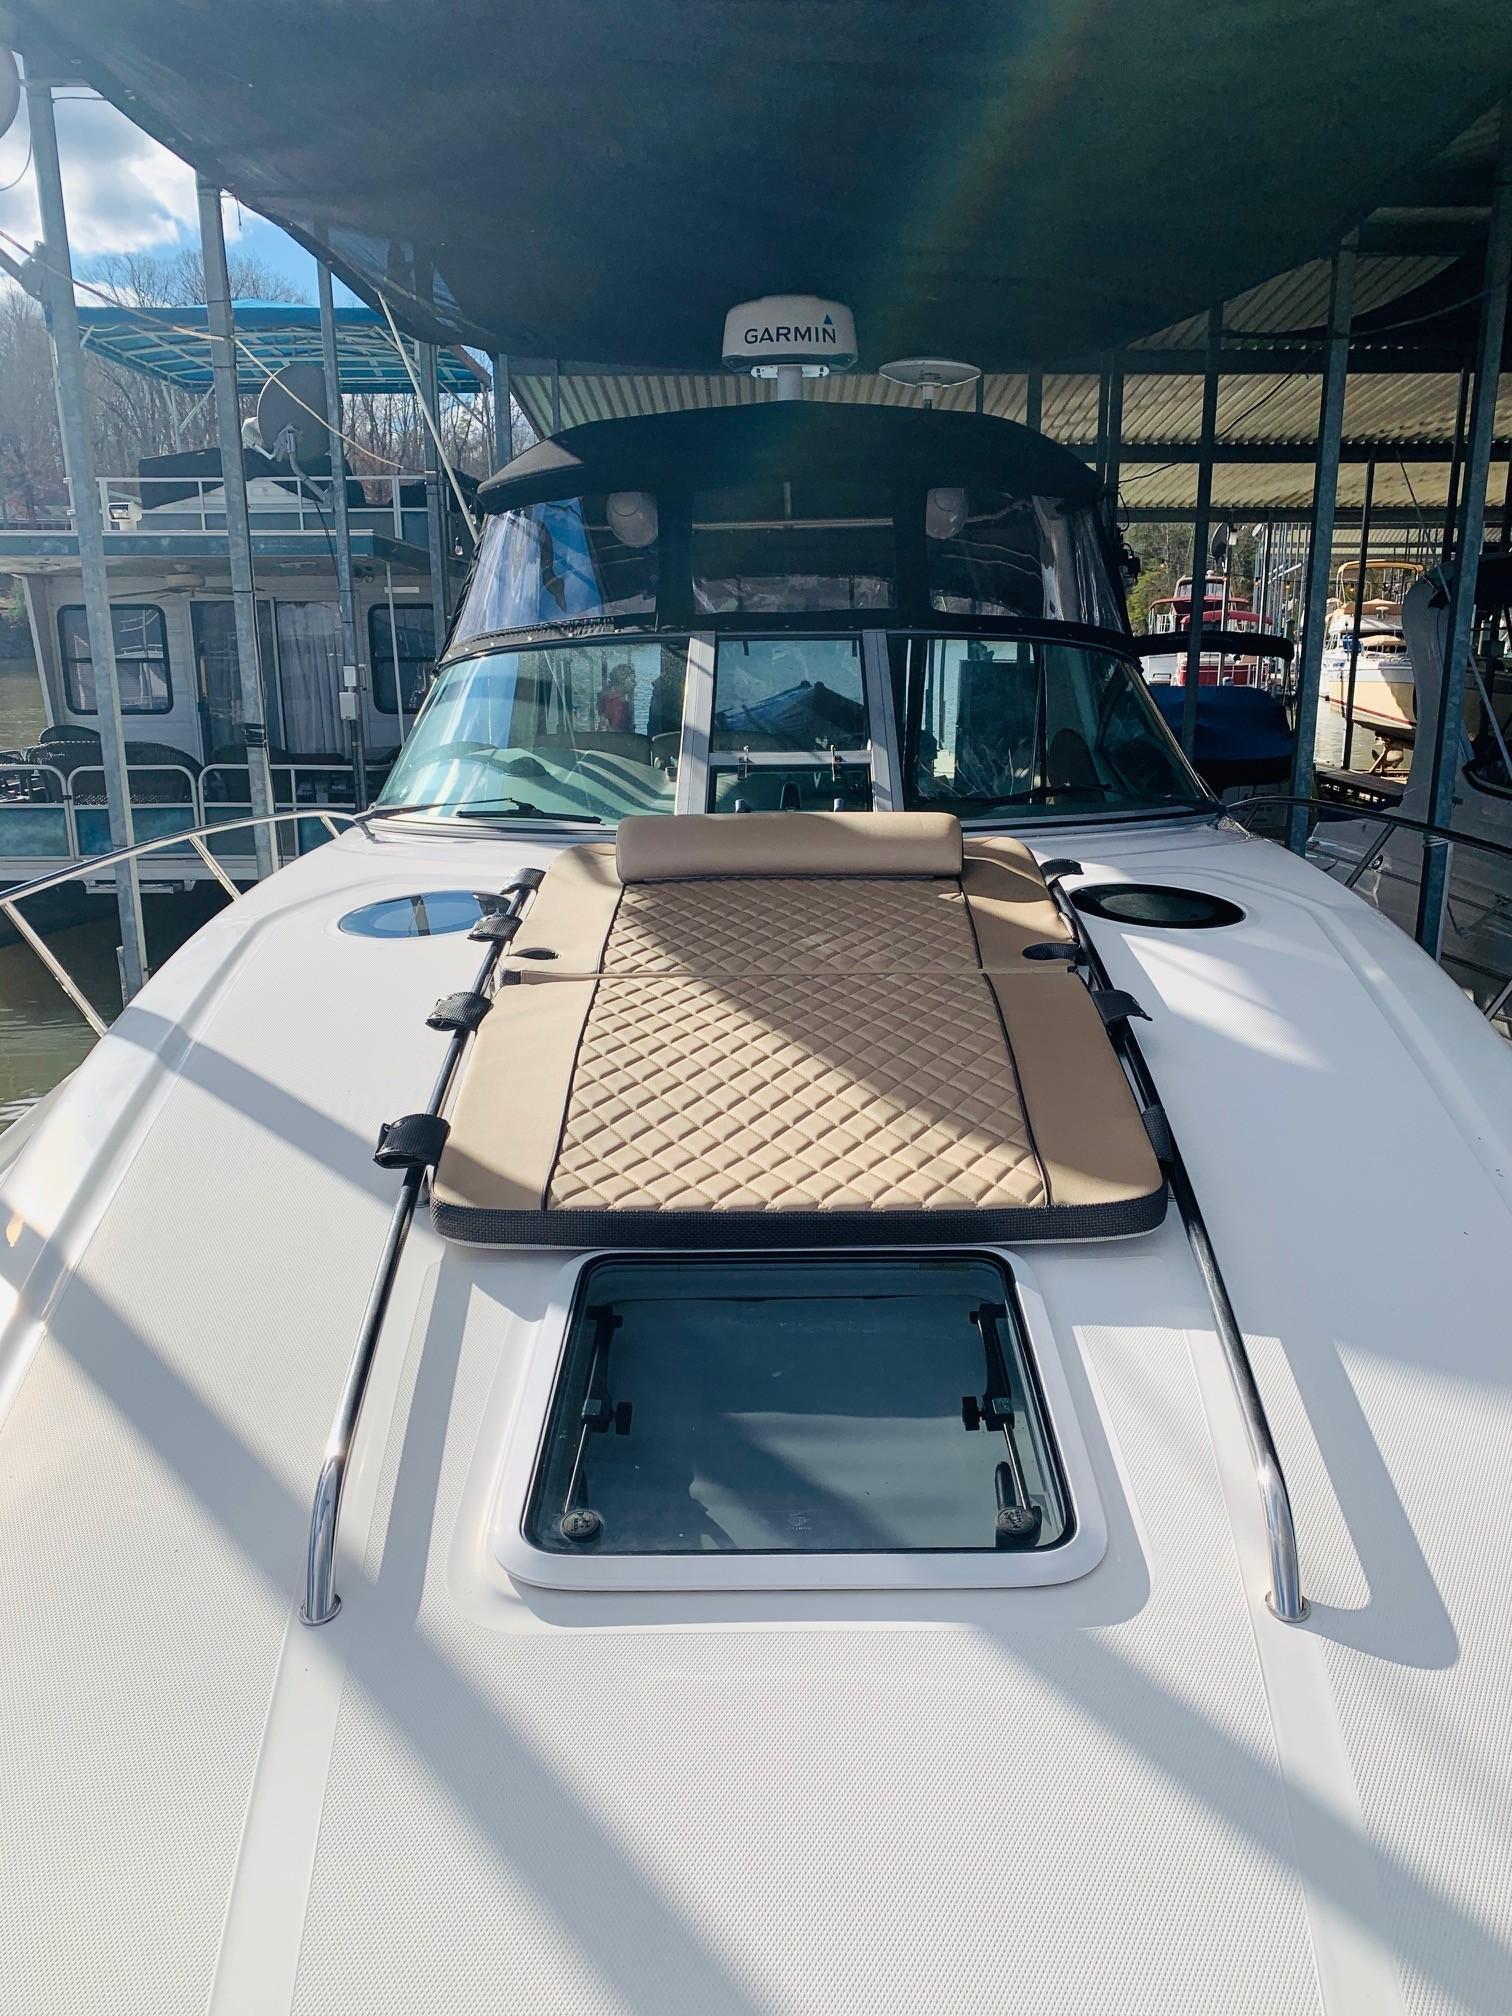 Sea Ray 320 Sundancer - Deck looking Aft